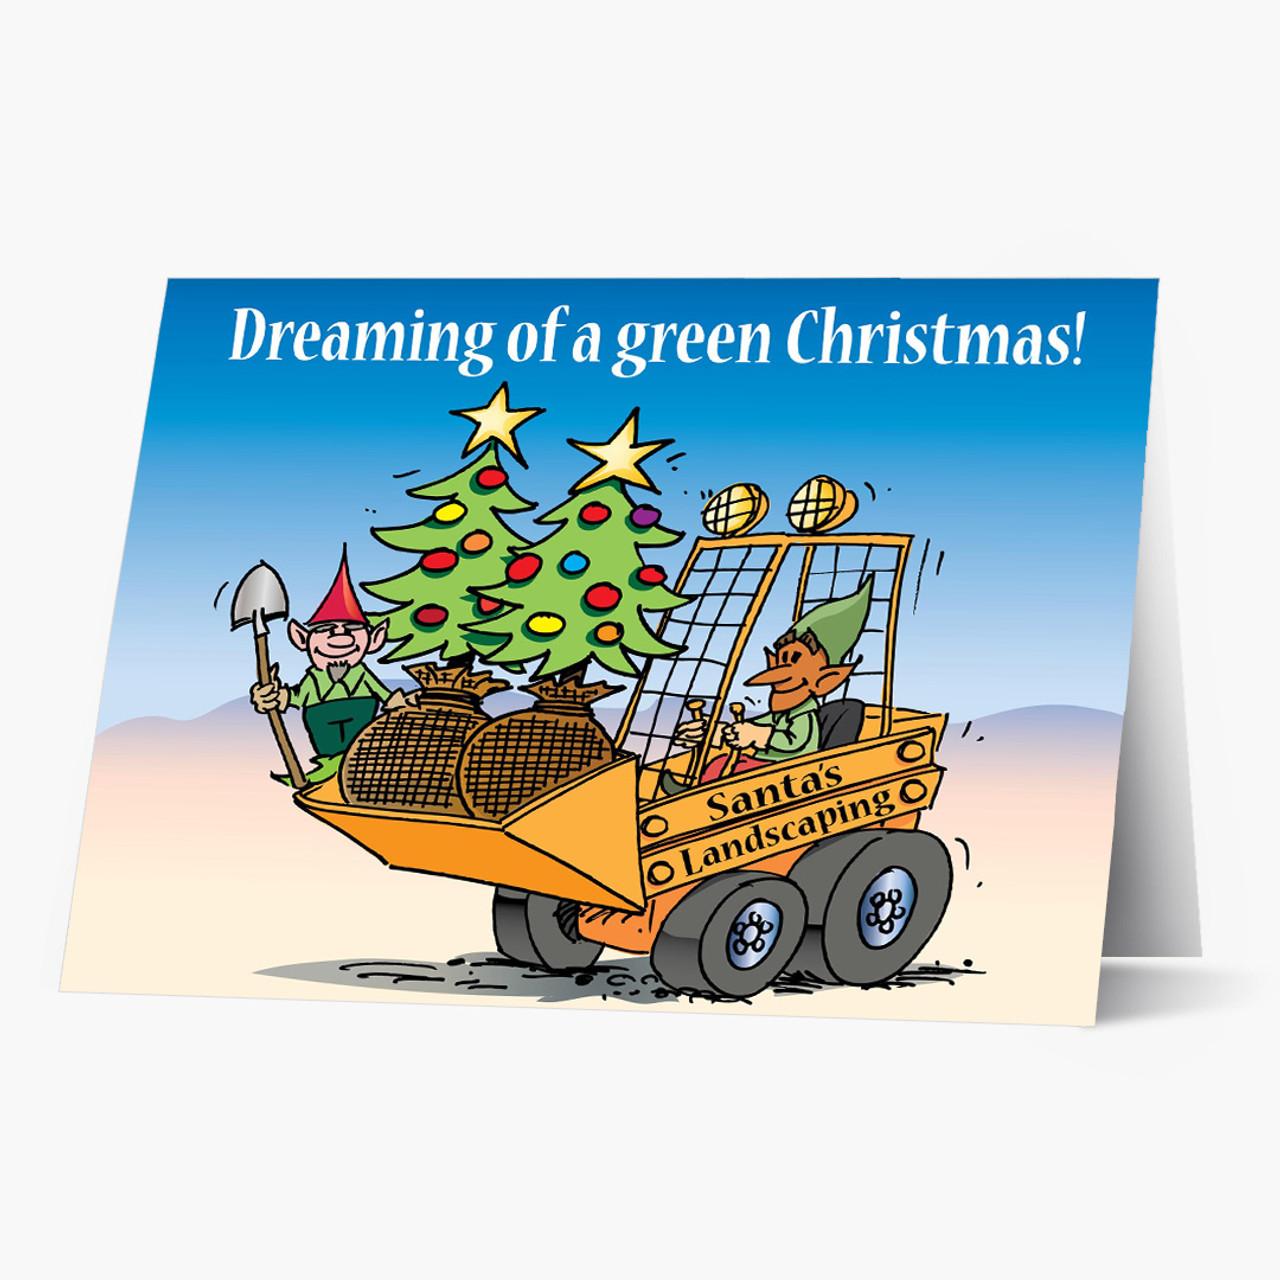 Santa's Landscaping